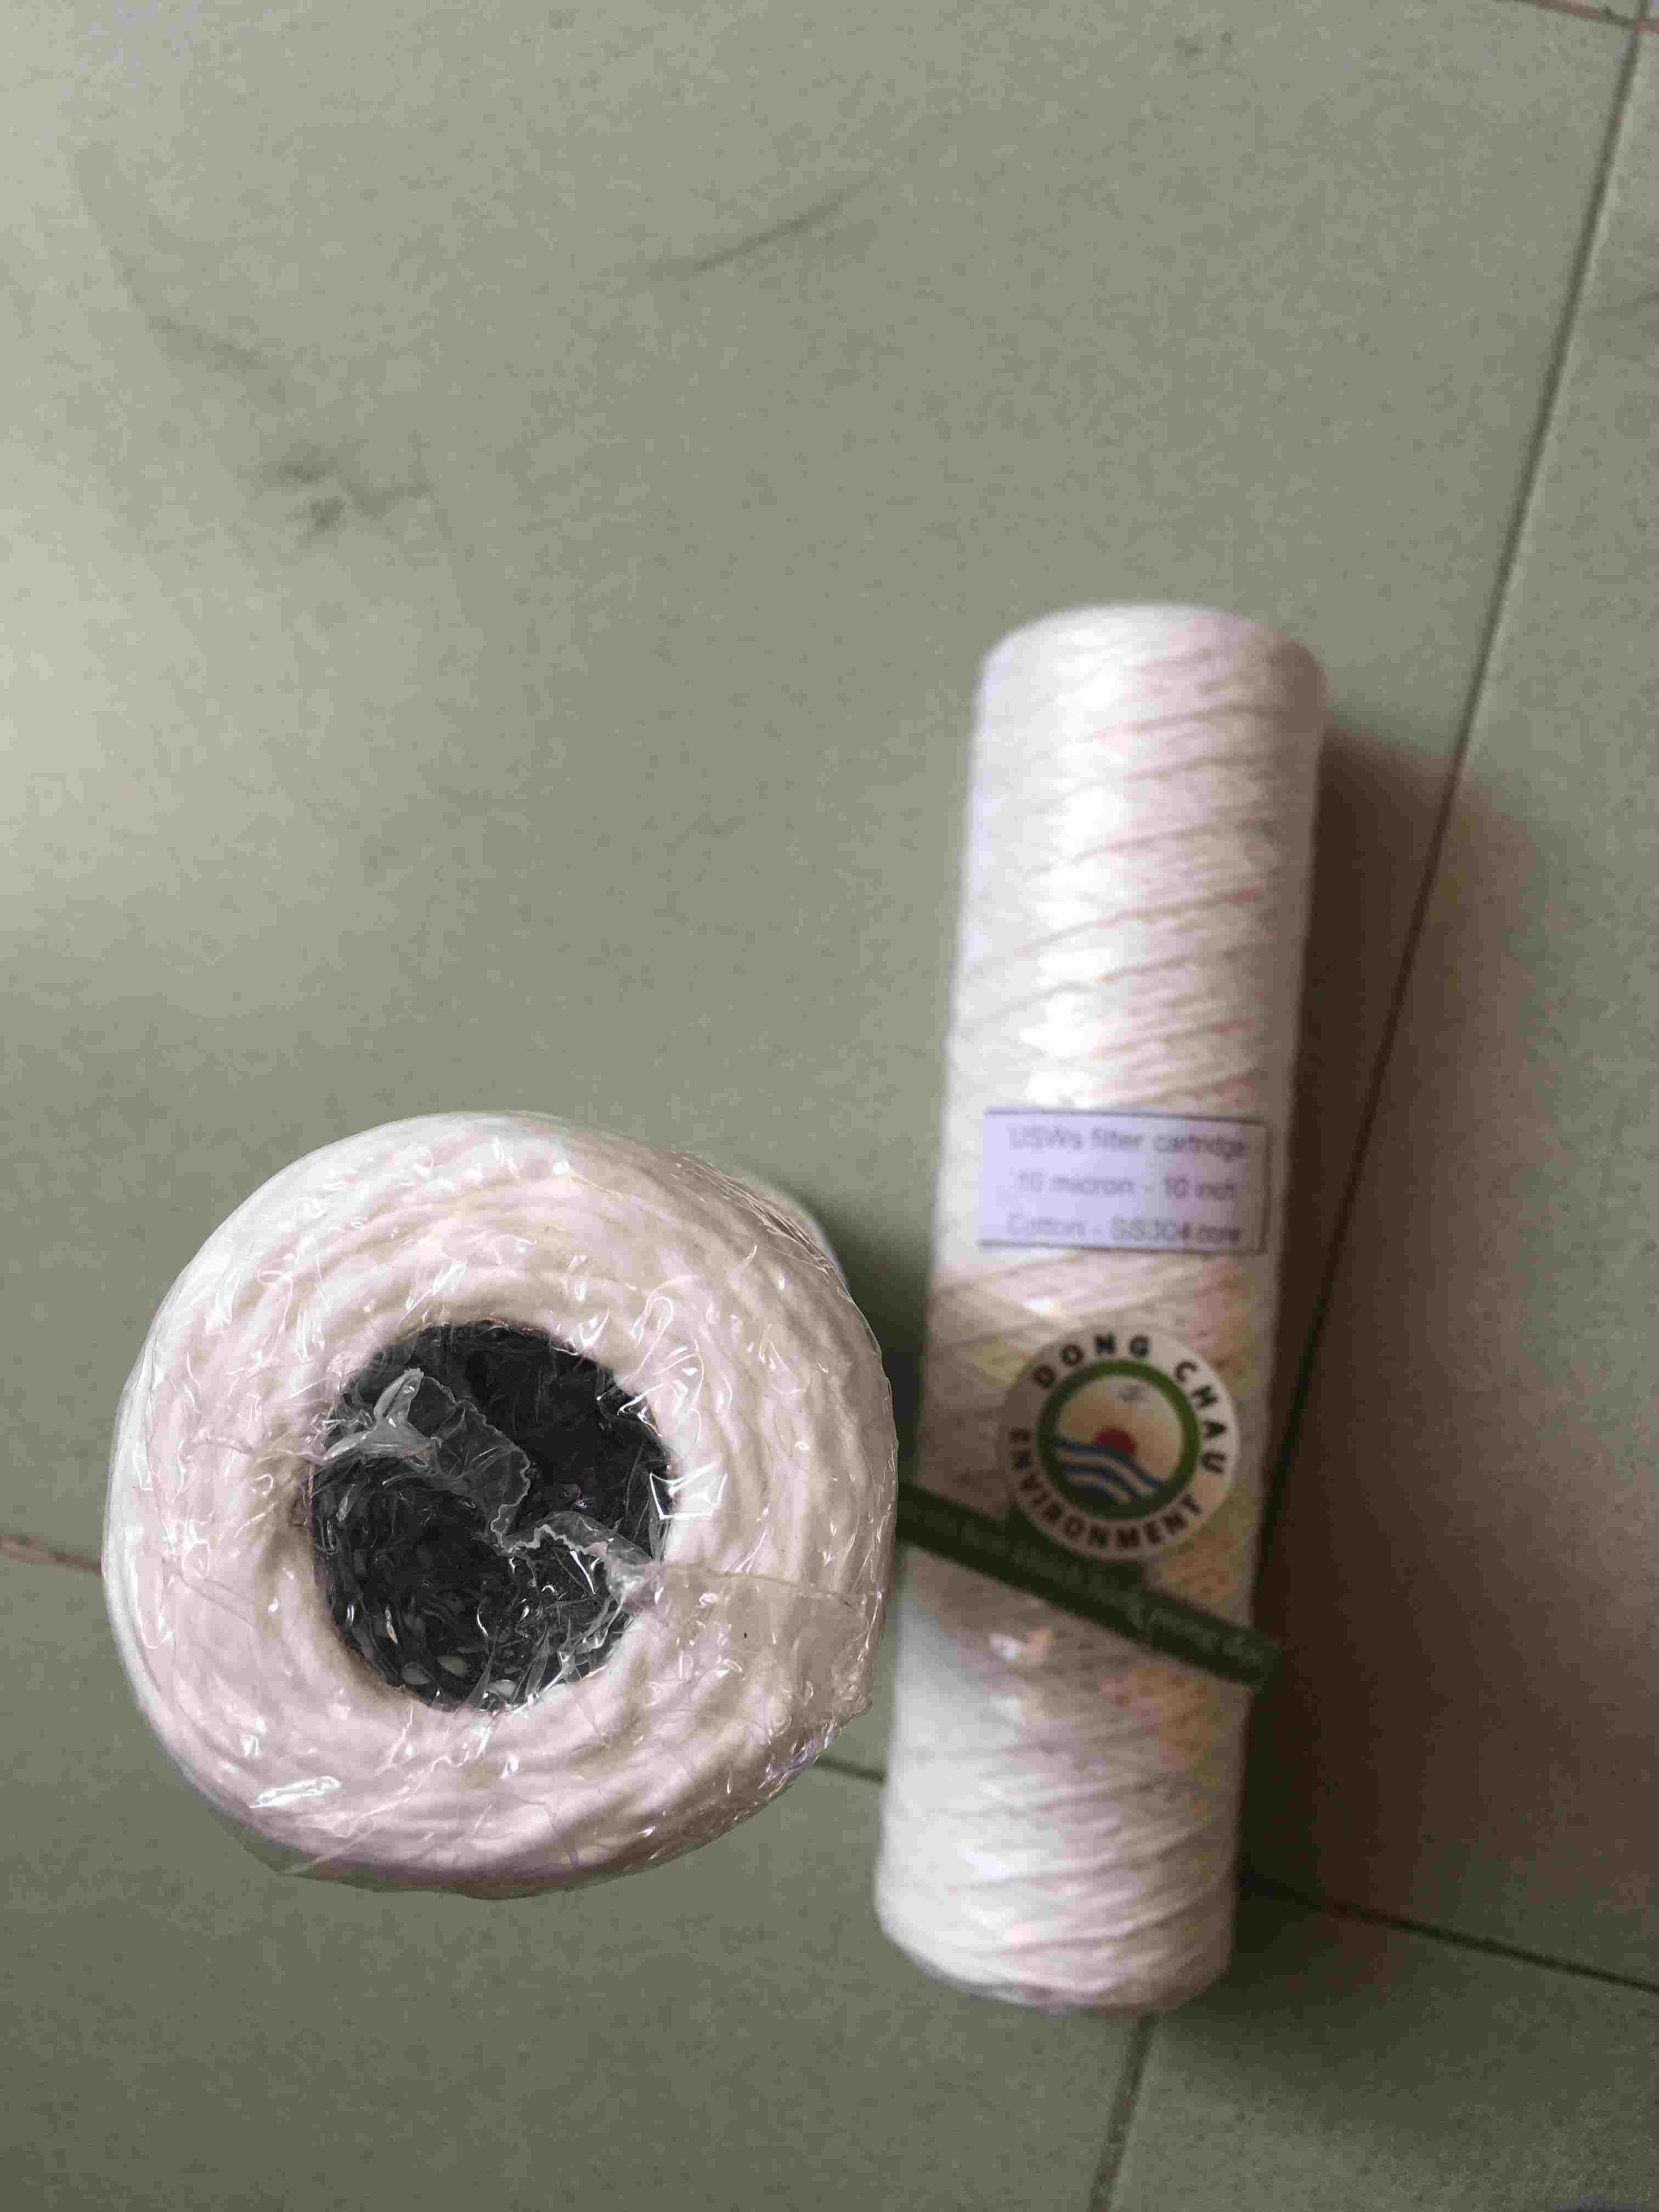 Lõi lọc sợi inox 5 micron 10 inch